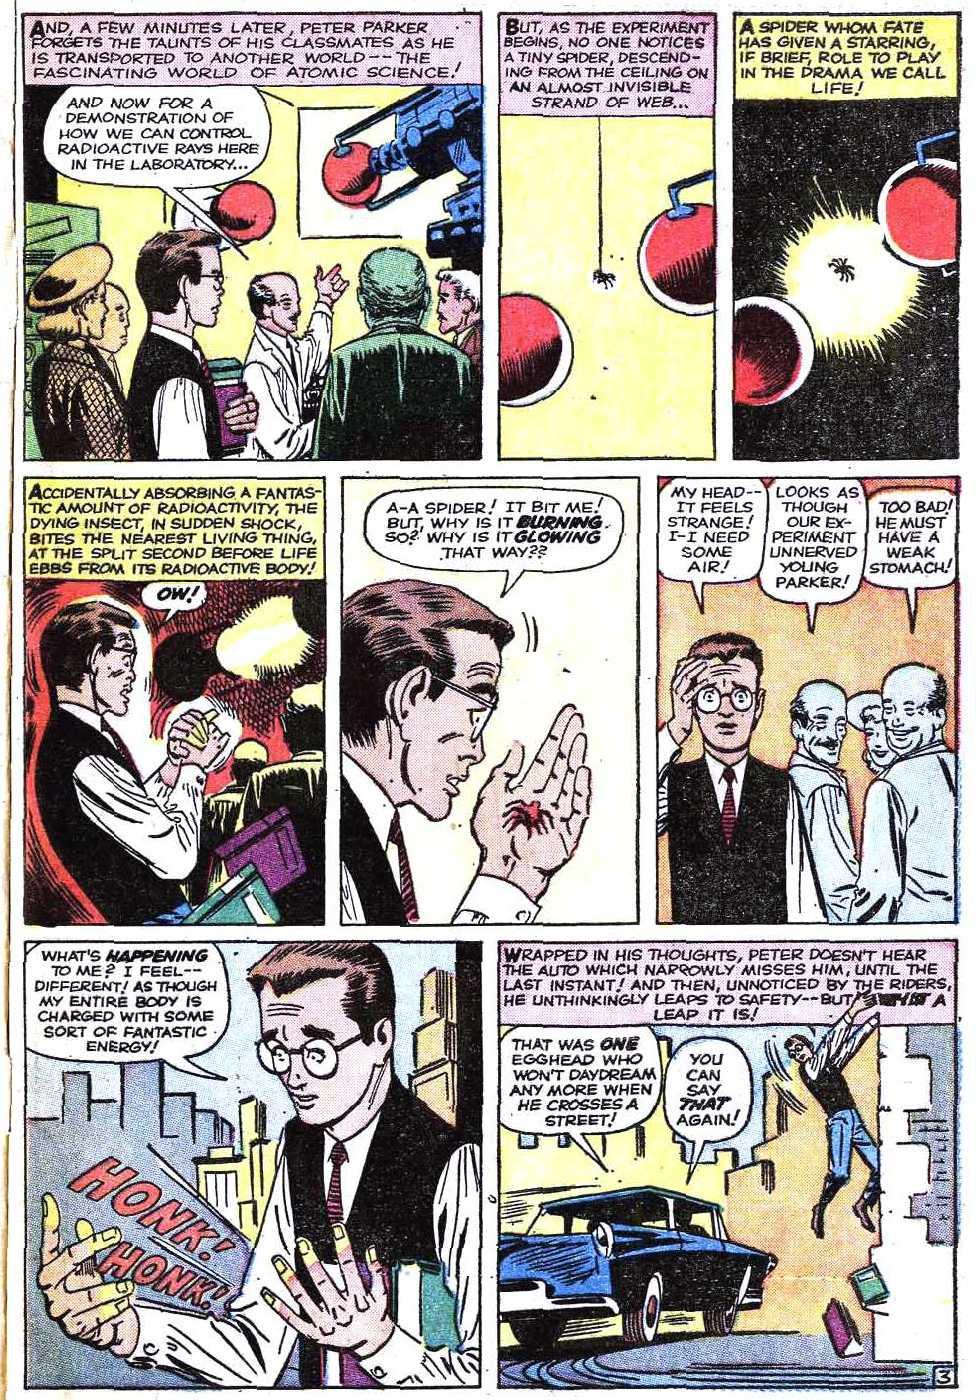 The warrior 39 s comic book den amazing fantasy 15 spider man - Marvel spiderman comics pdf ...